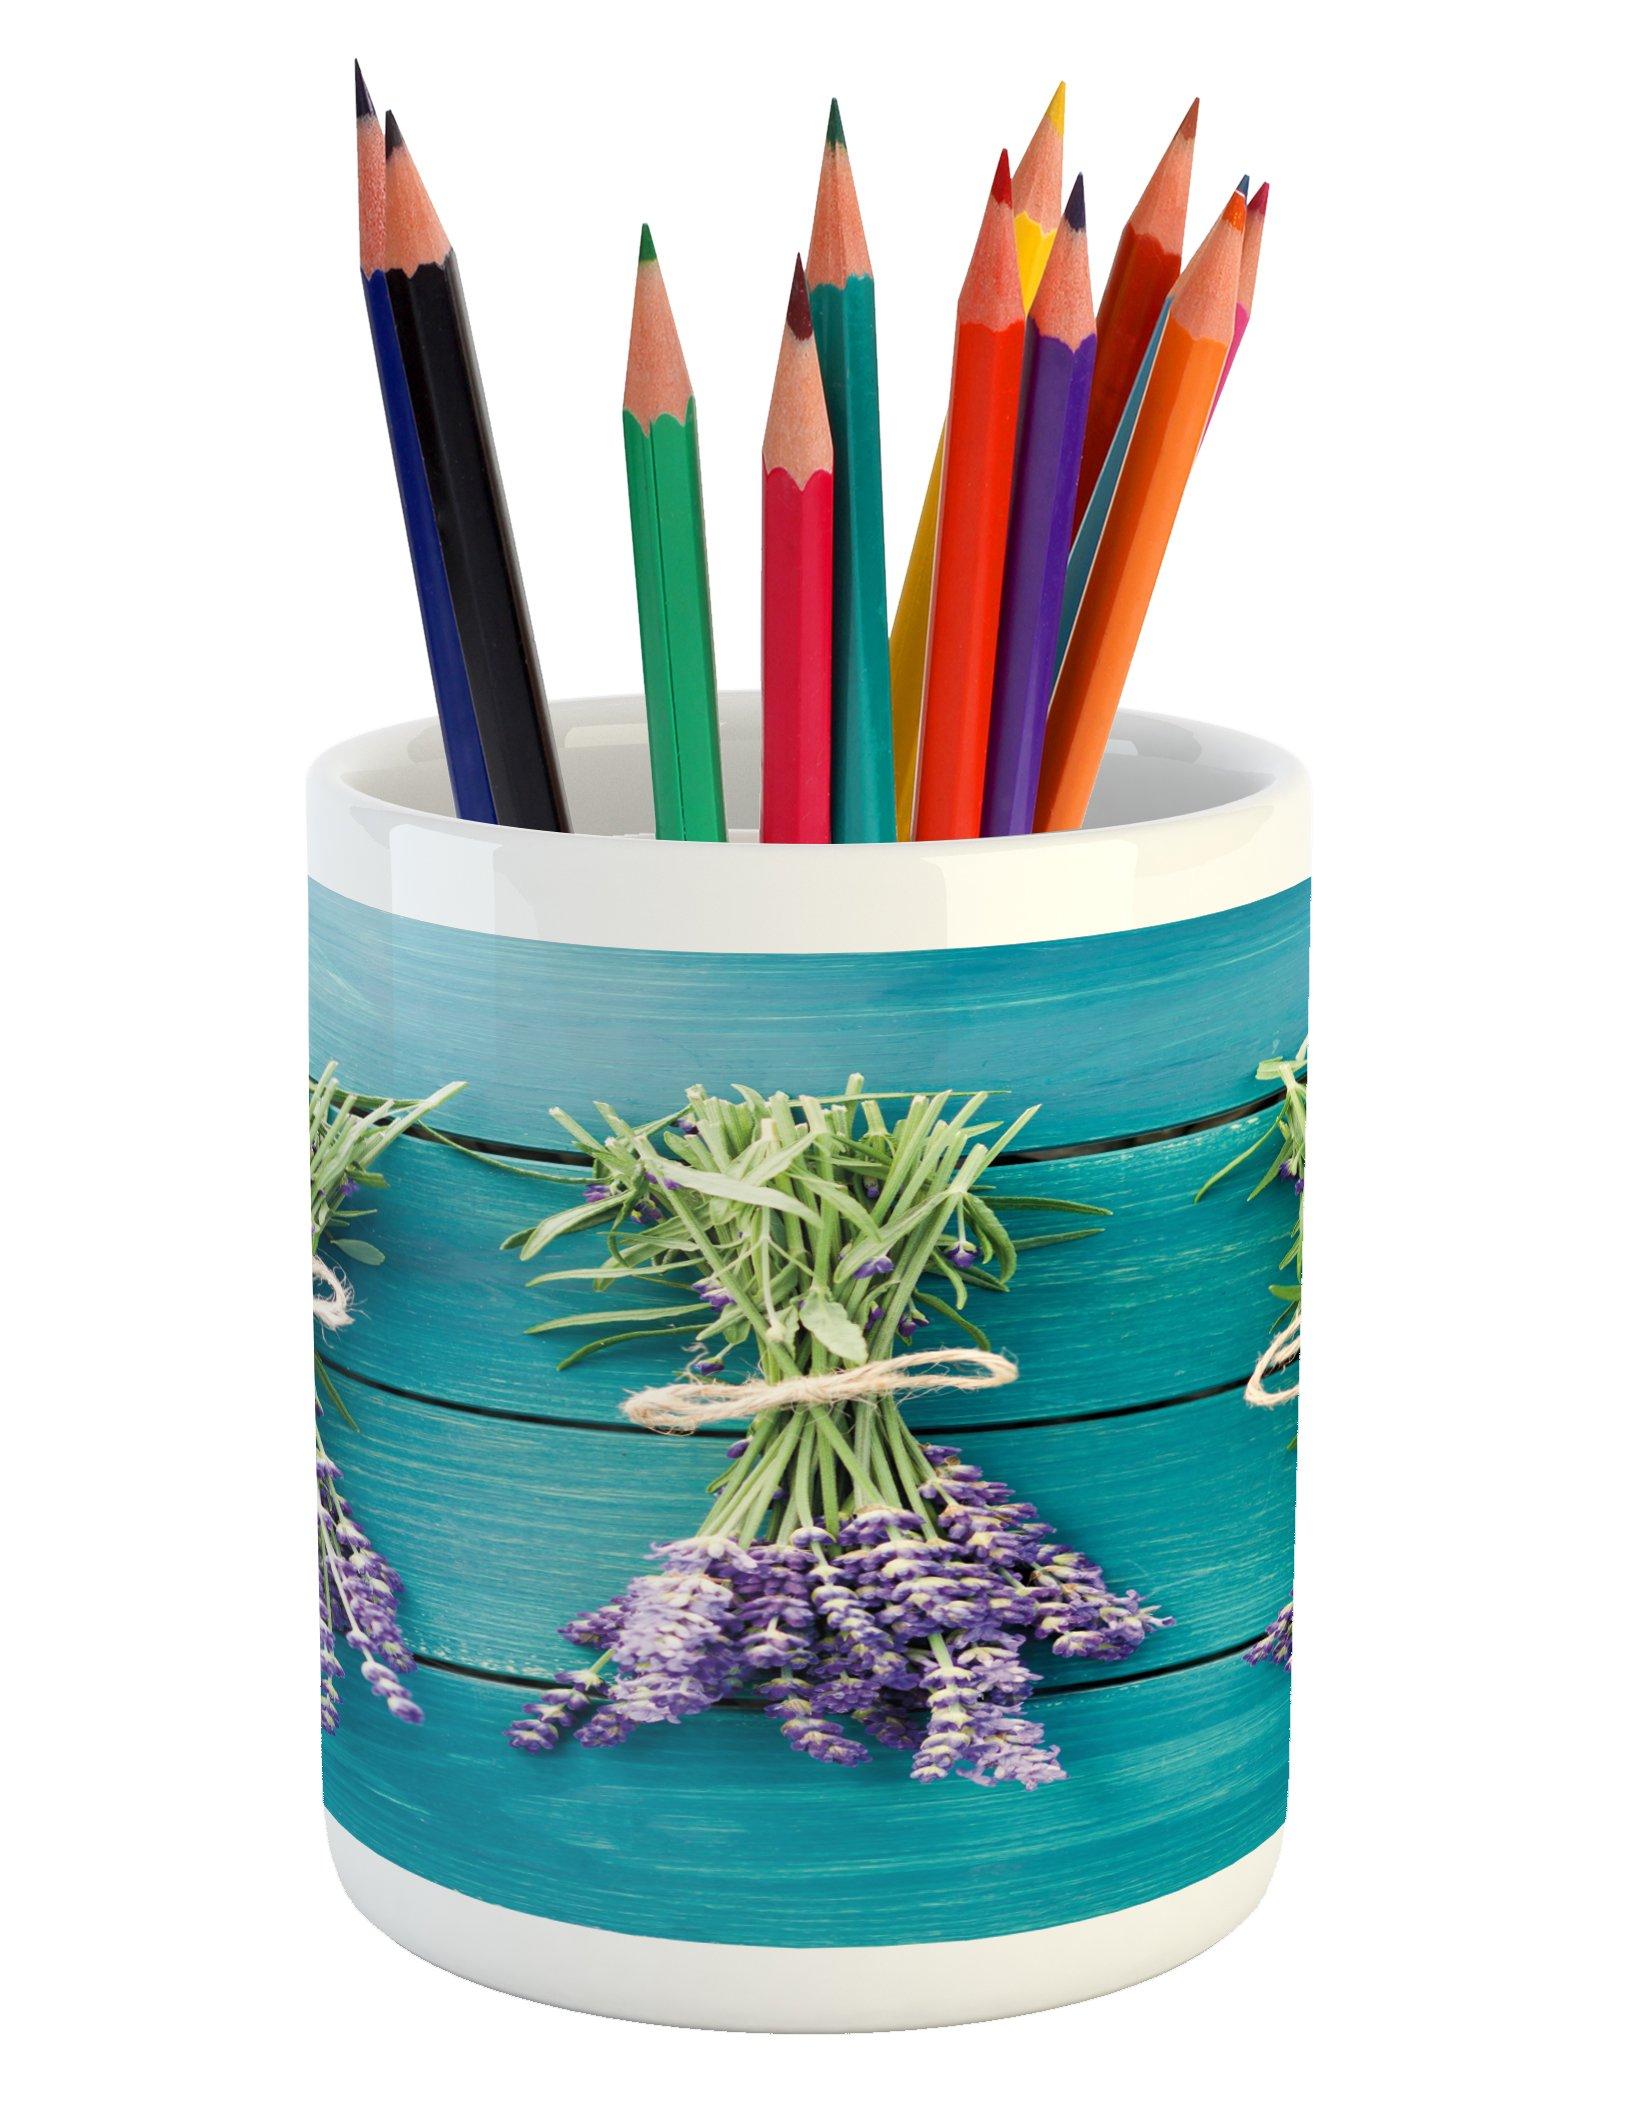 Lunarable Lavender Pencil Pen Holder, Fresh Lavender Bouquets on Blue Wooden Planks Rustic Relaxing Spa, Printed Ceramic Pencil Pen Holder for Desk Office Accessory, Sky Blue Lavender Green